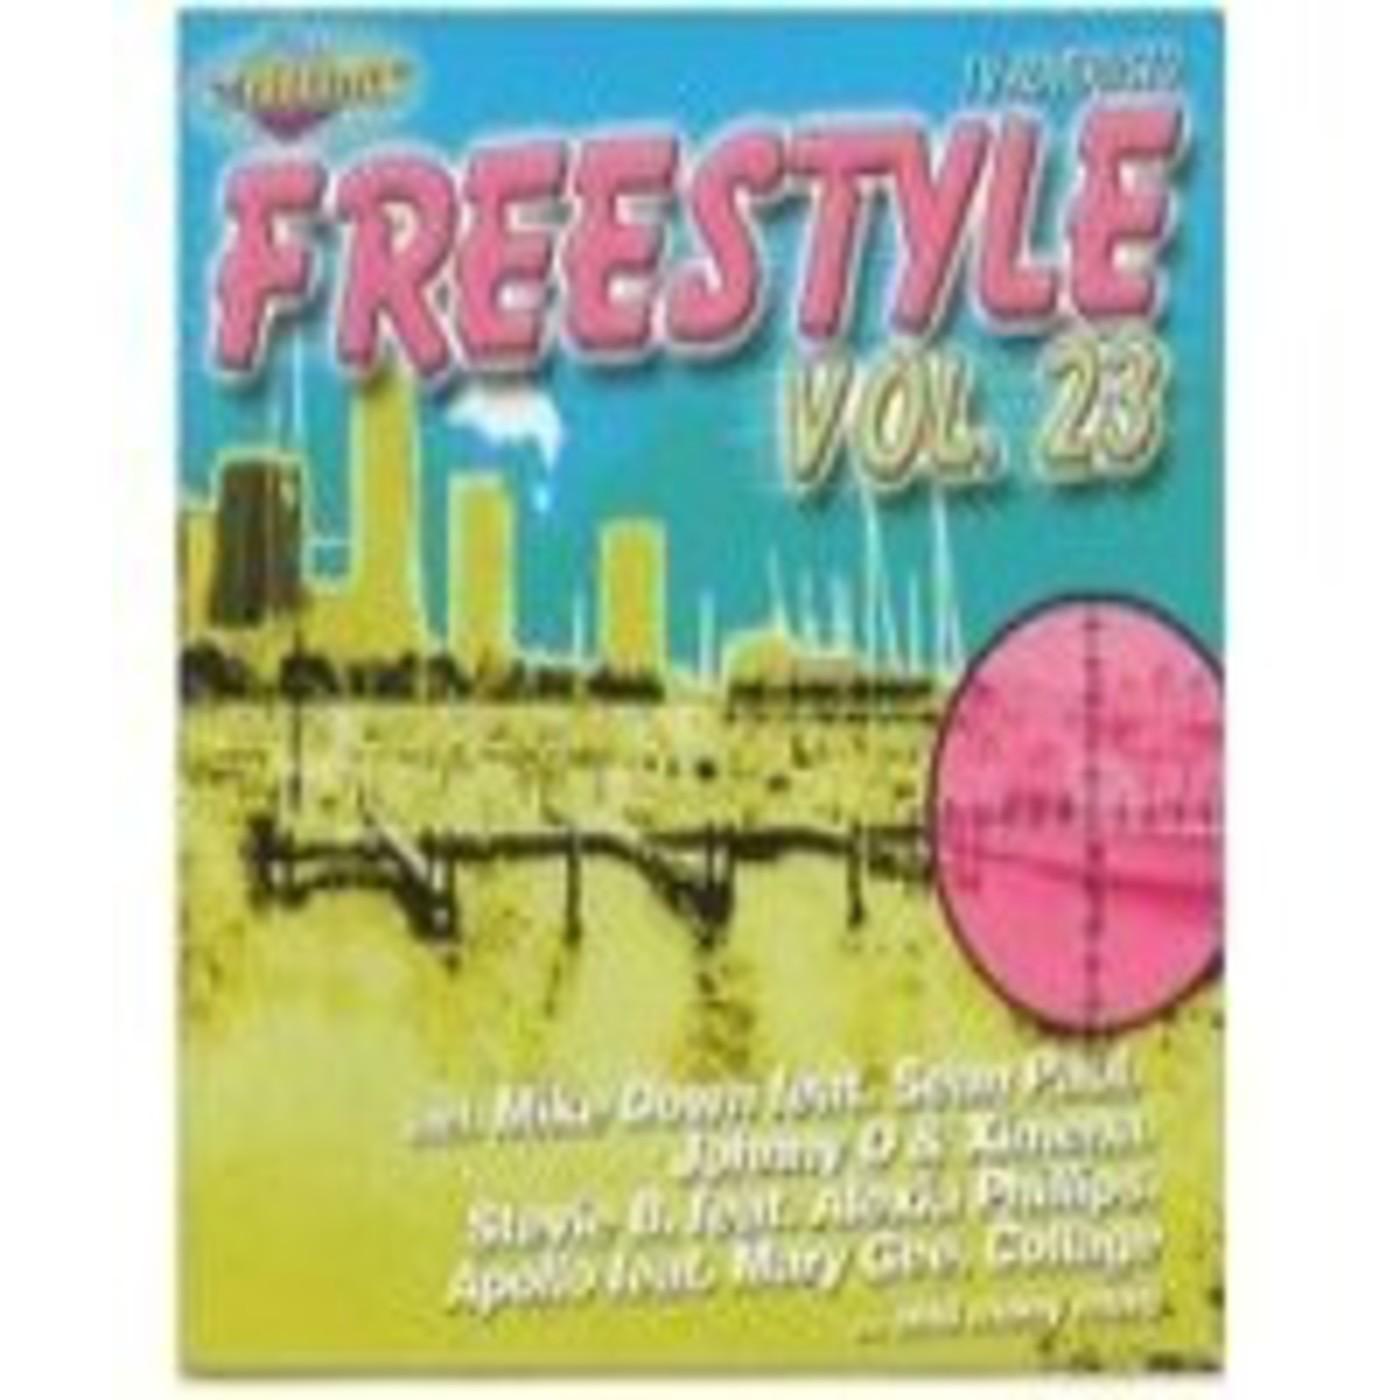 VA. Freestyle Vol. 23